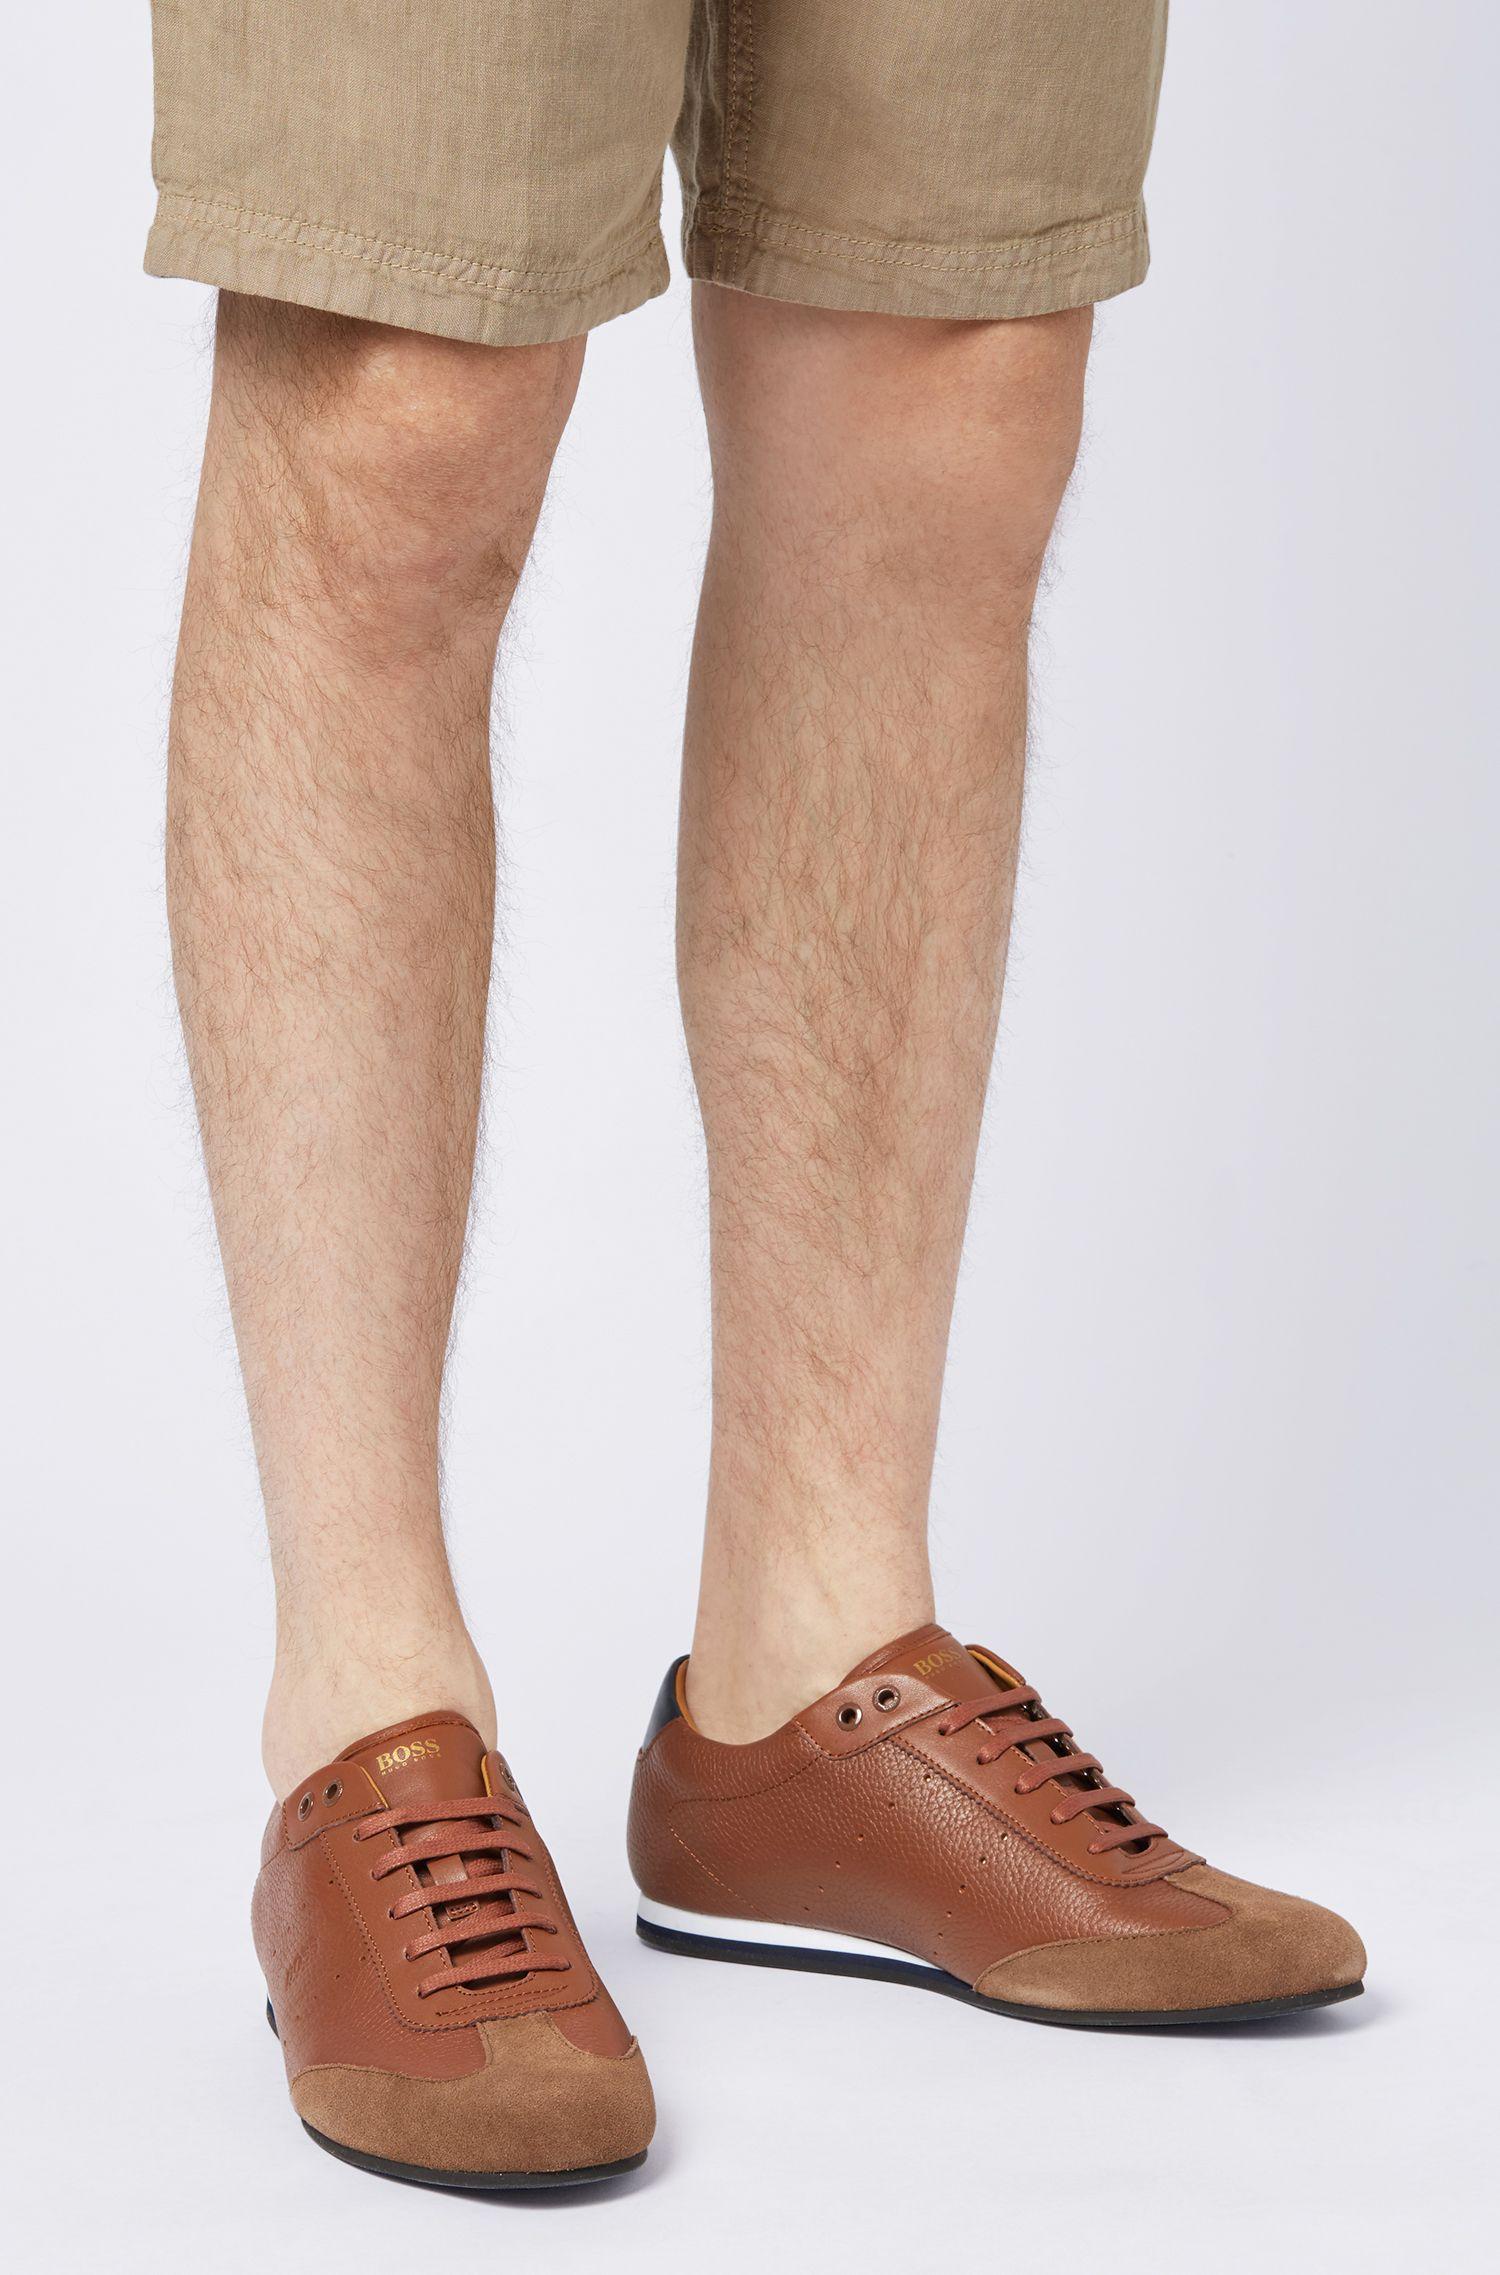 Hugo Boss - Lowtop Sneakers aus Veloursleder und gewalktem Leder - 4